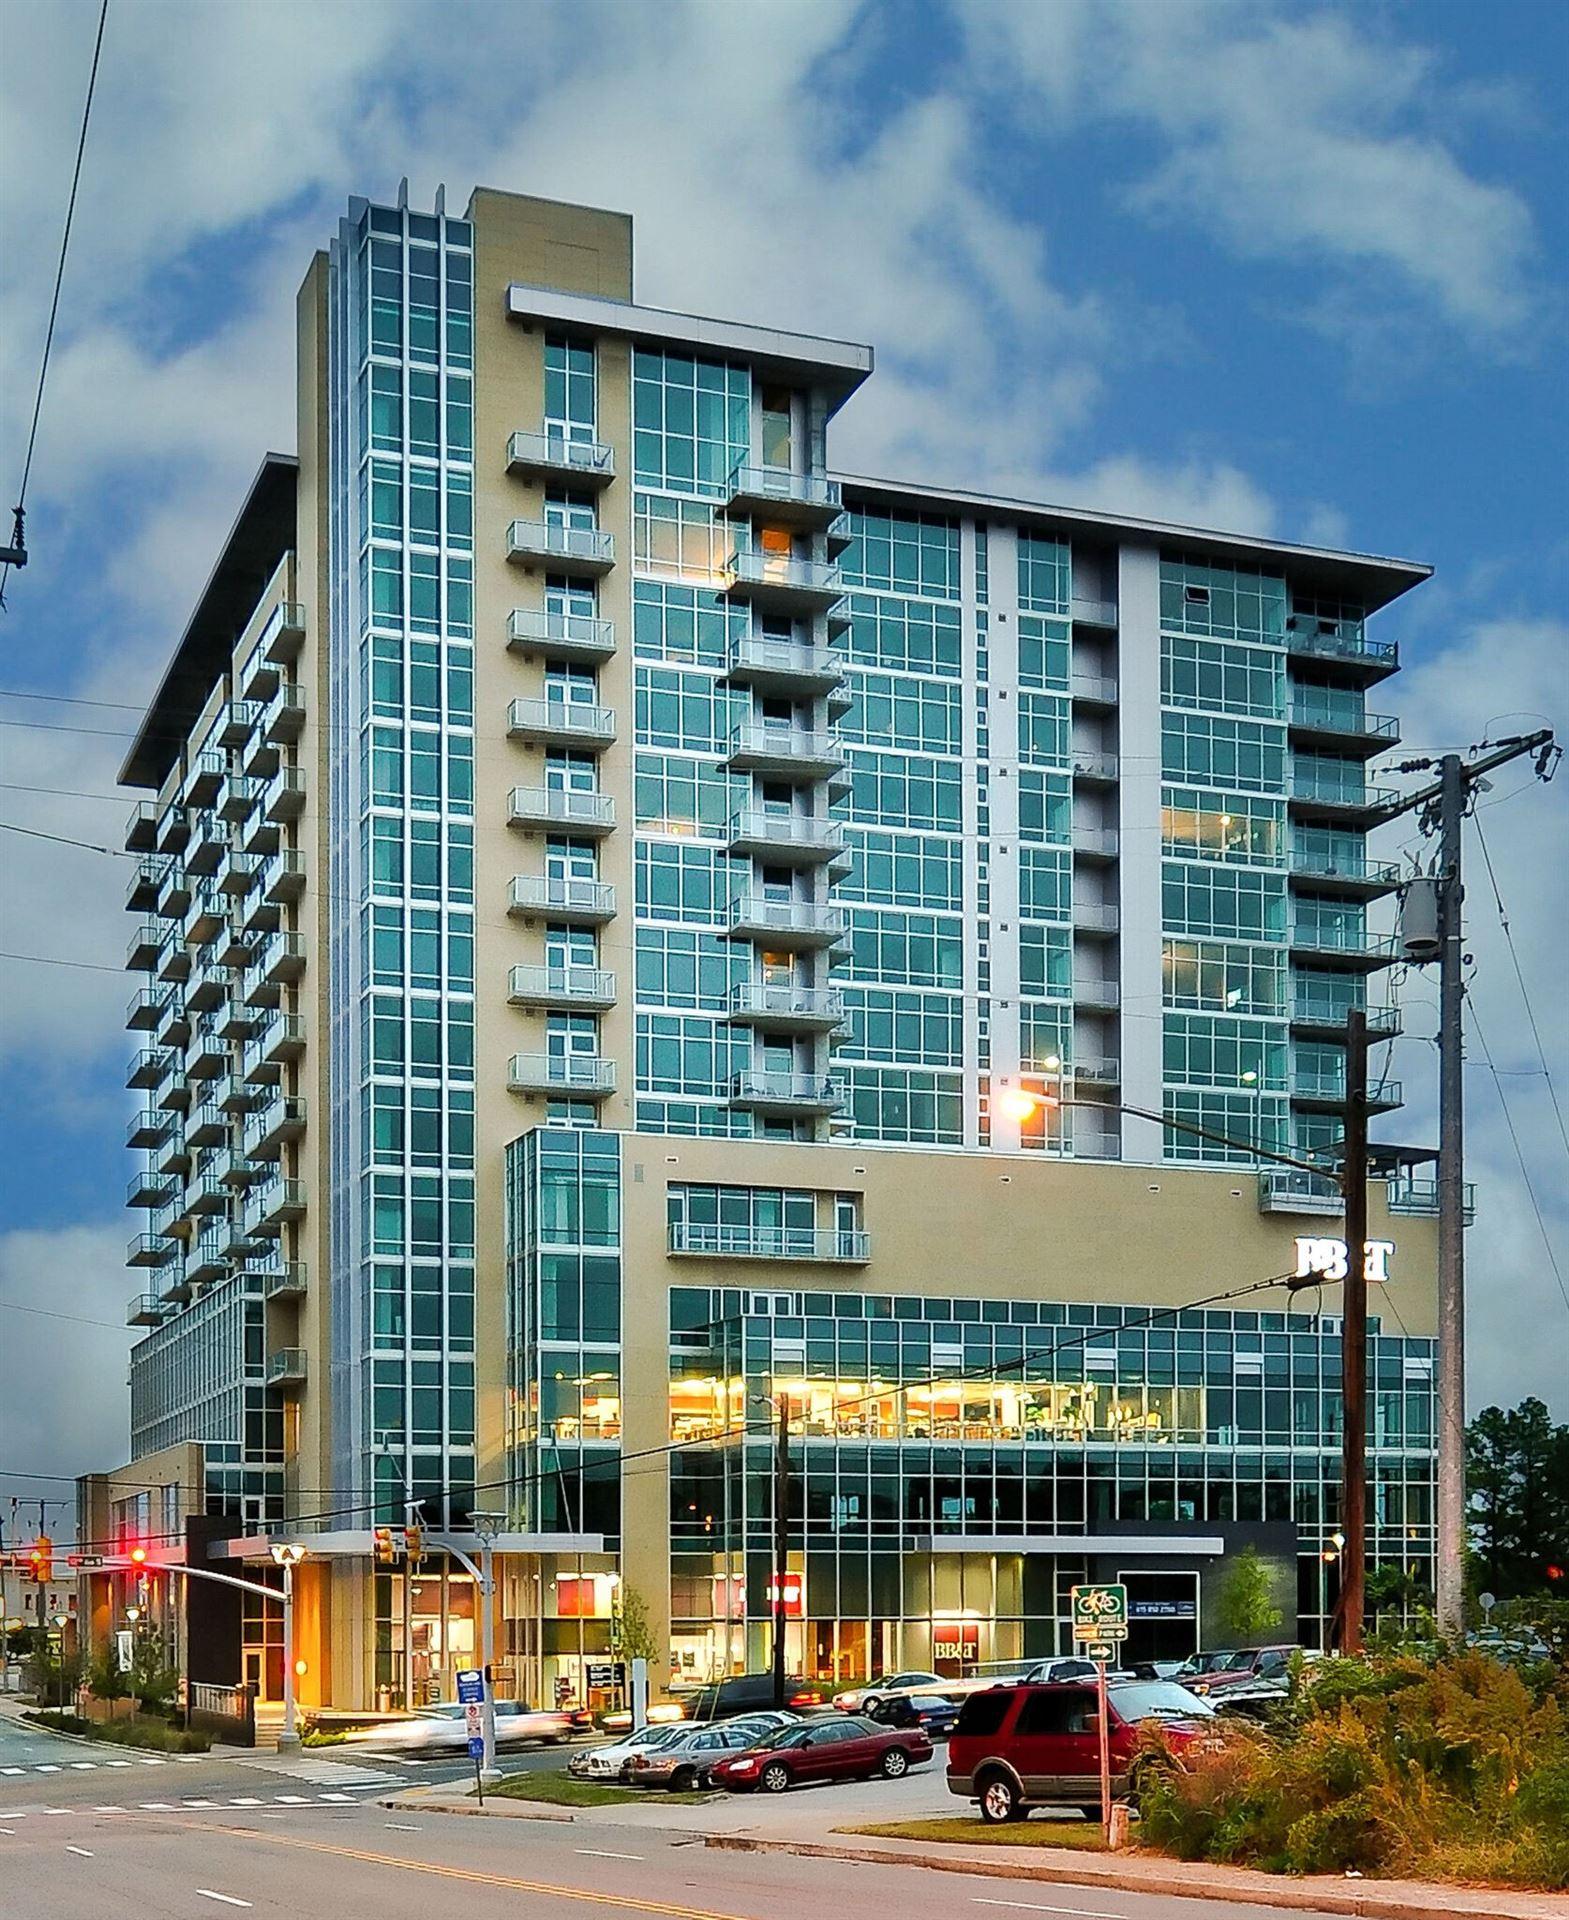 700 12th Ave S #610, Nashville, TN 37203 - MLS#: 2220550